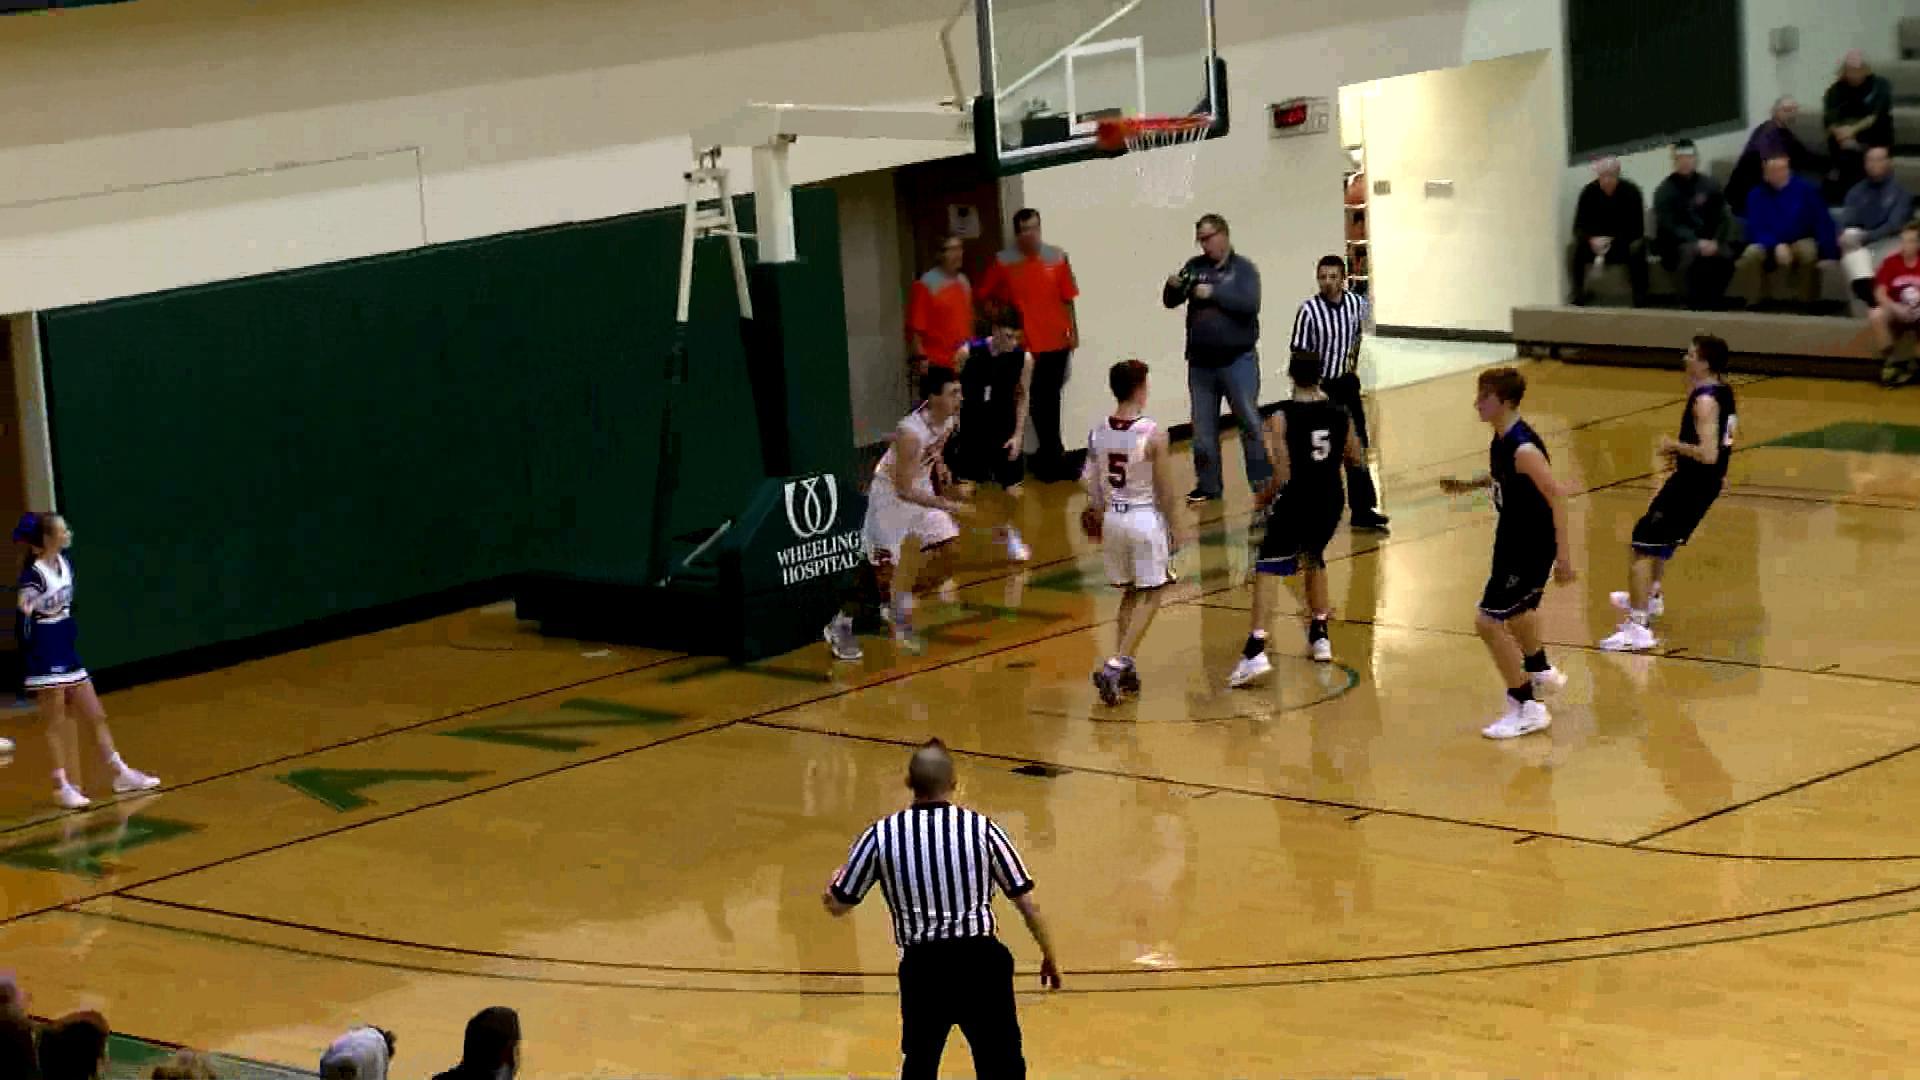 12.22.18 Highlights: St. Clairsville vs. Philo - boys basketball